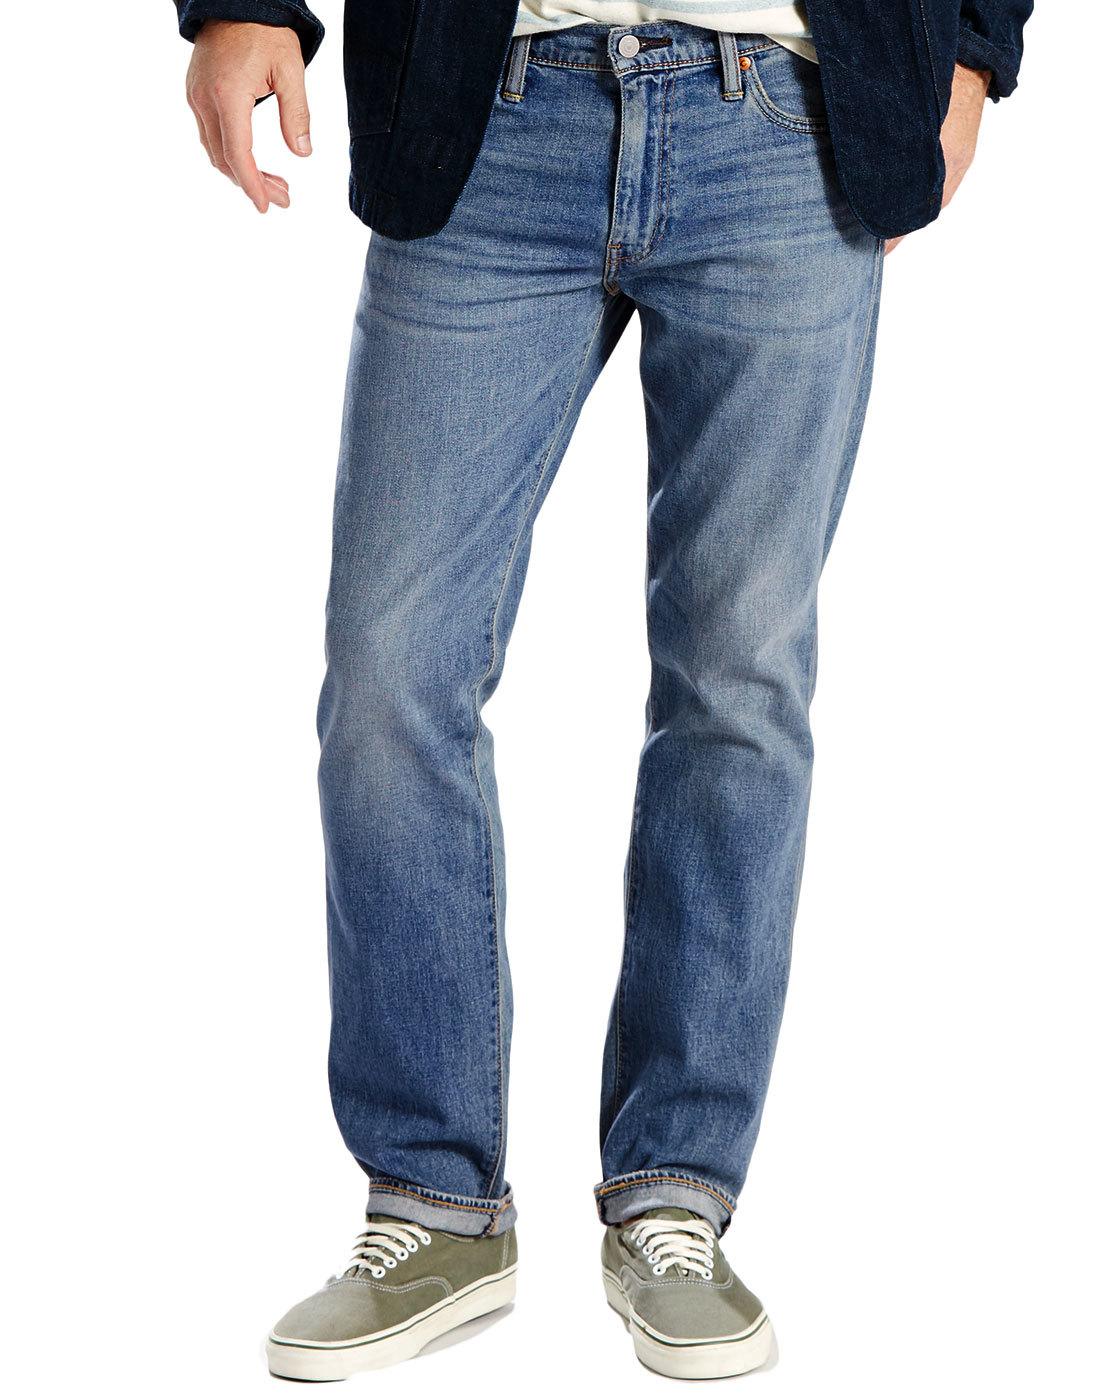 levi 39 s 504 retro mod regular straight denim jeans in. Black Bedroom Furniture Sets. Home Design Ideas